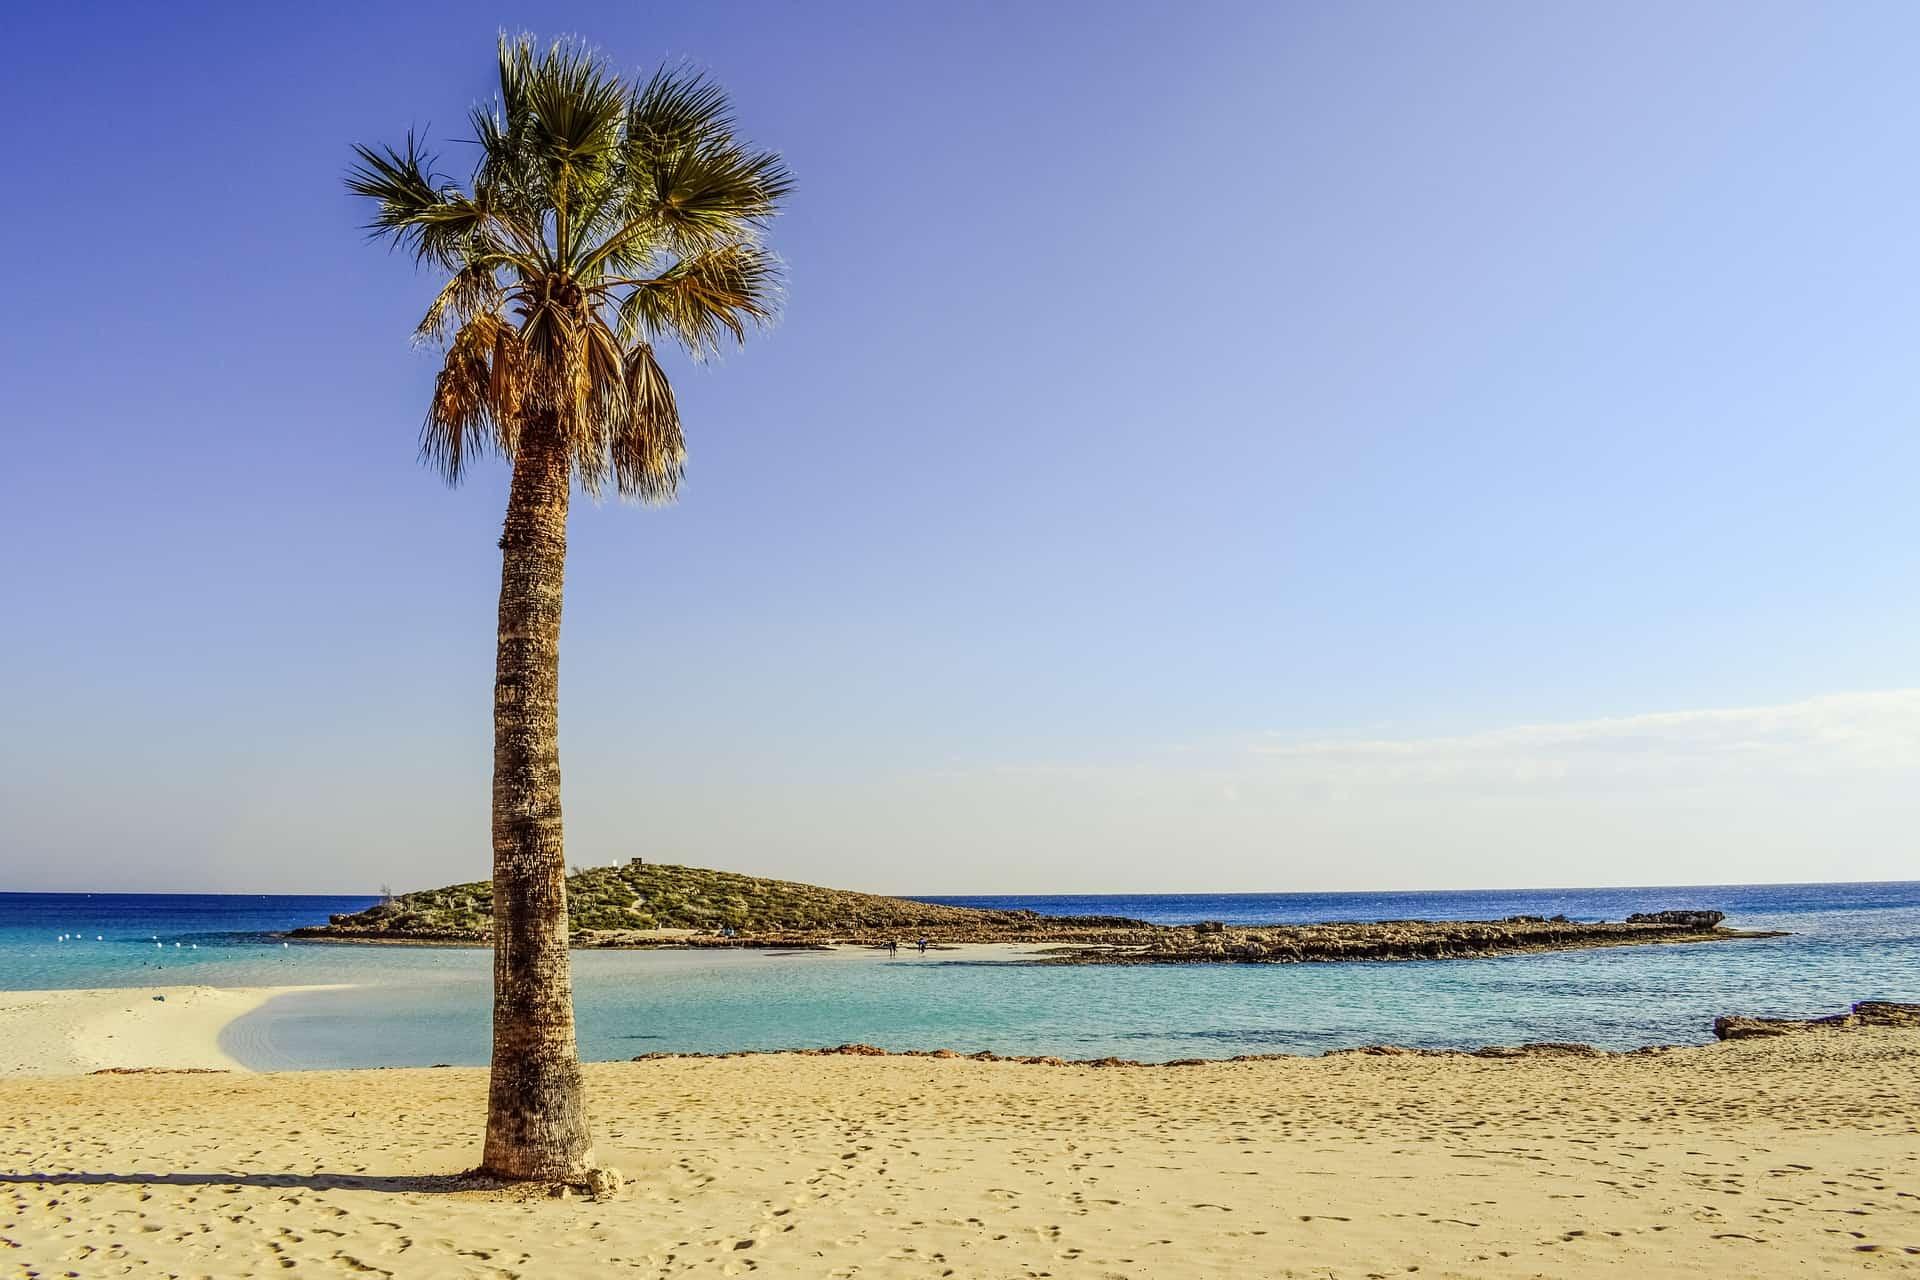 Ferien im Mittelmeer